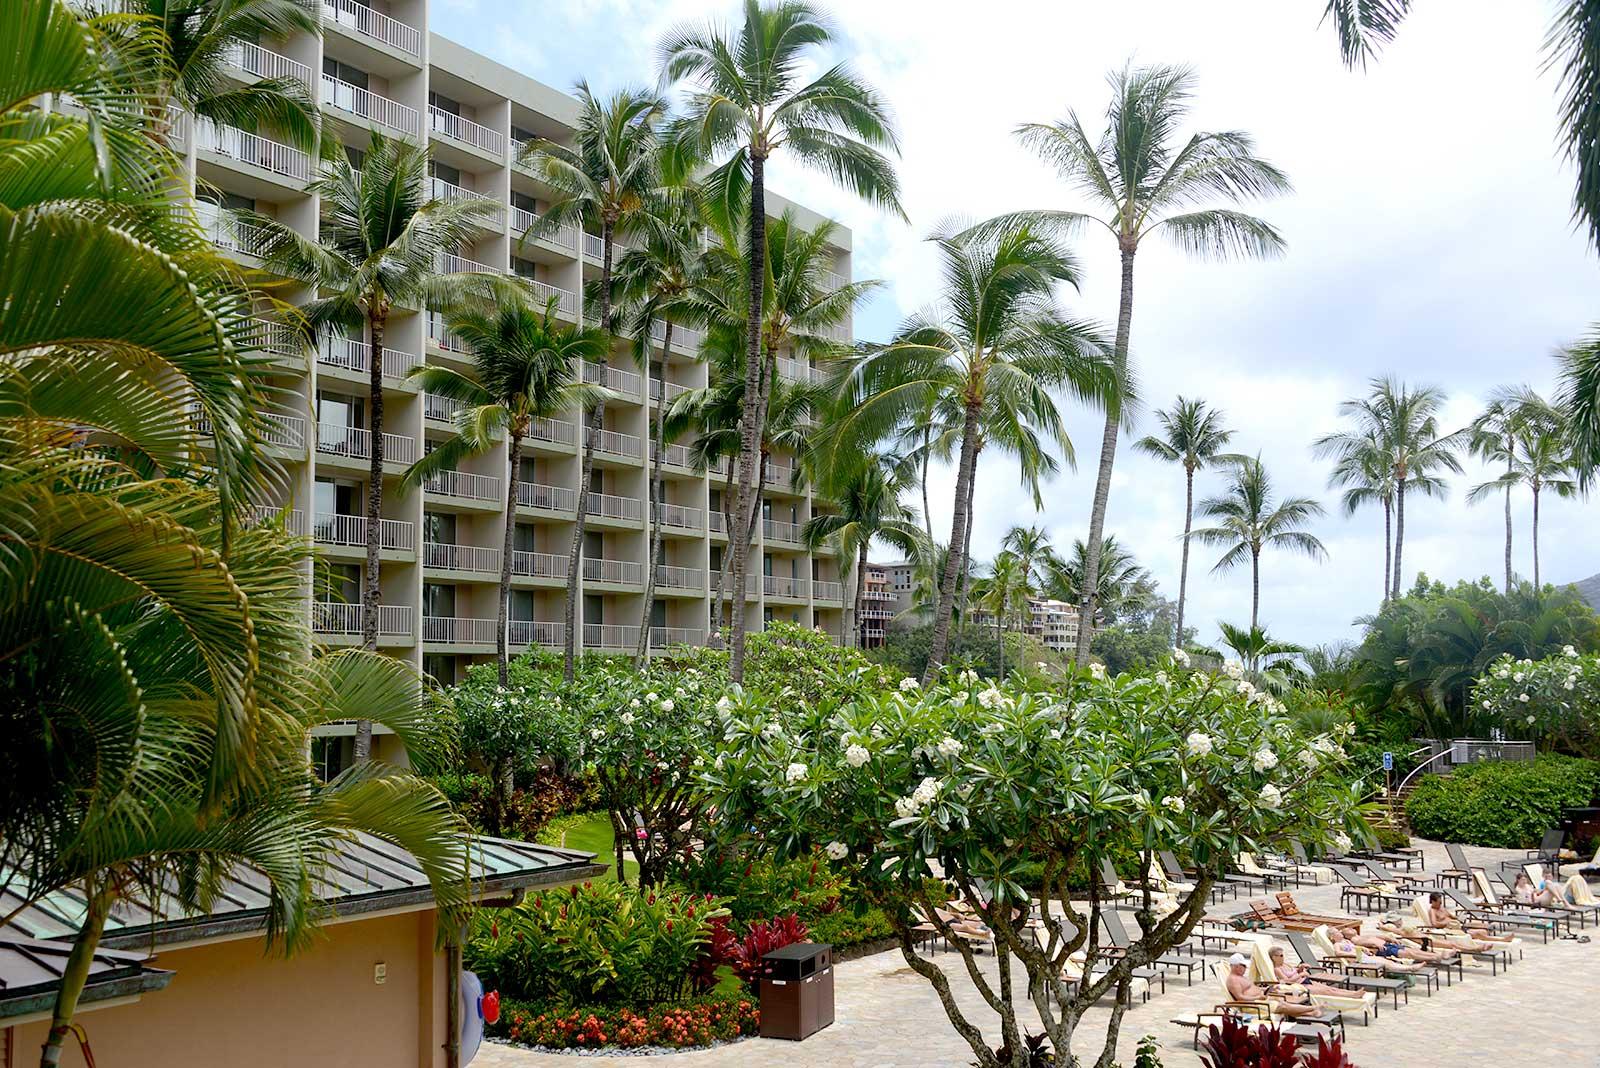 Marriott-Kauai-Beach-Club-Resort-31